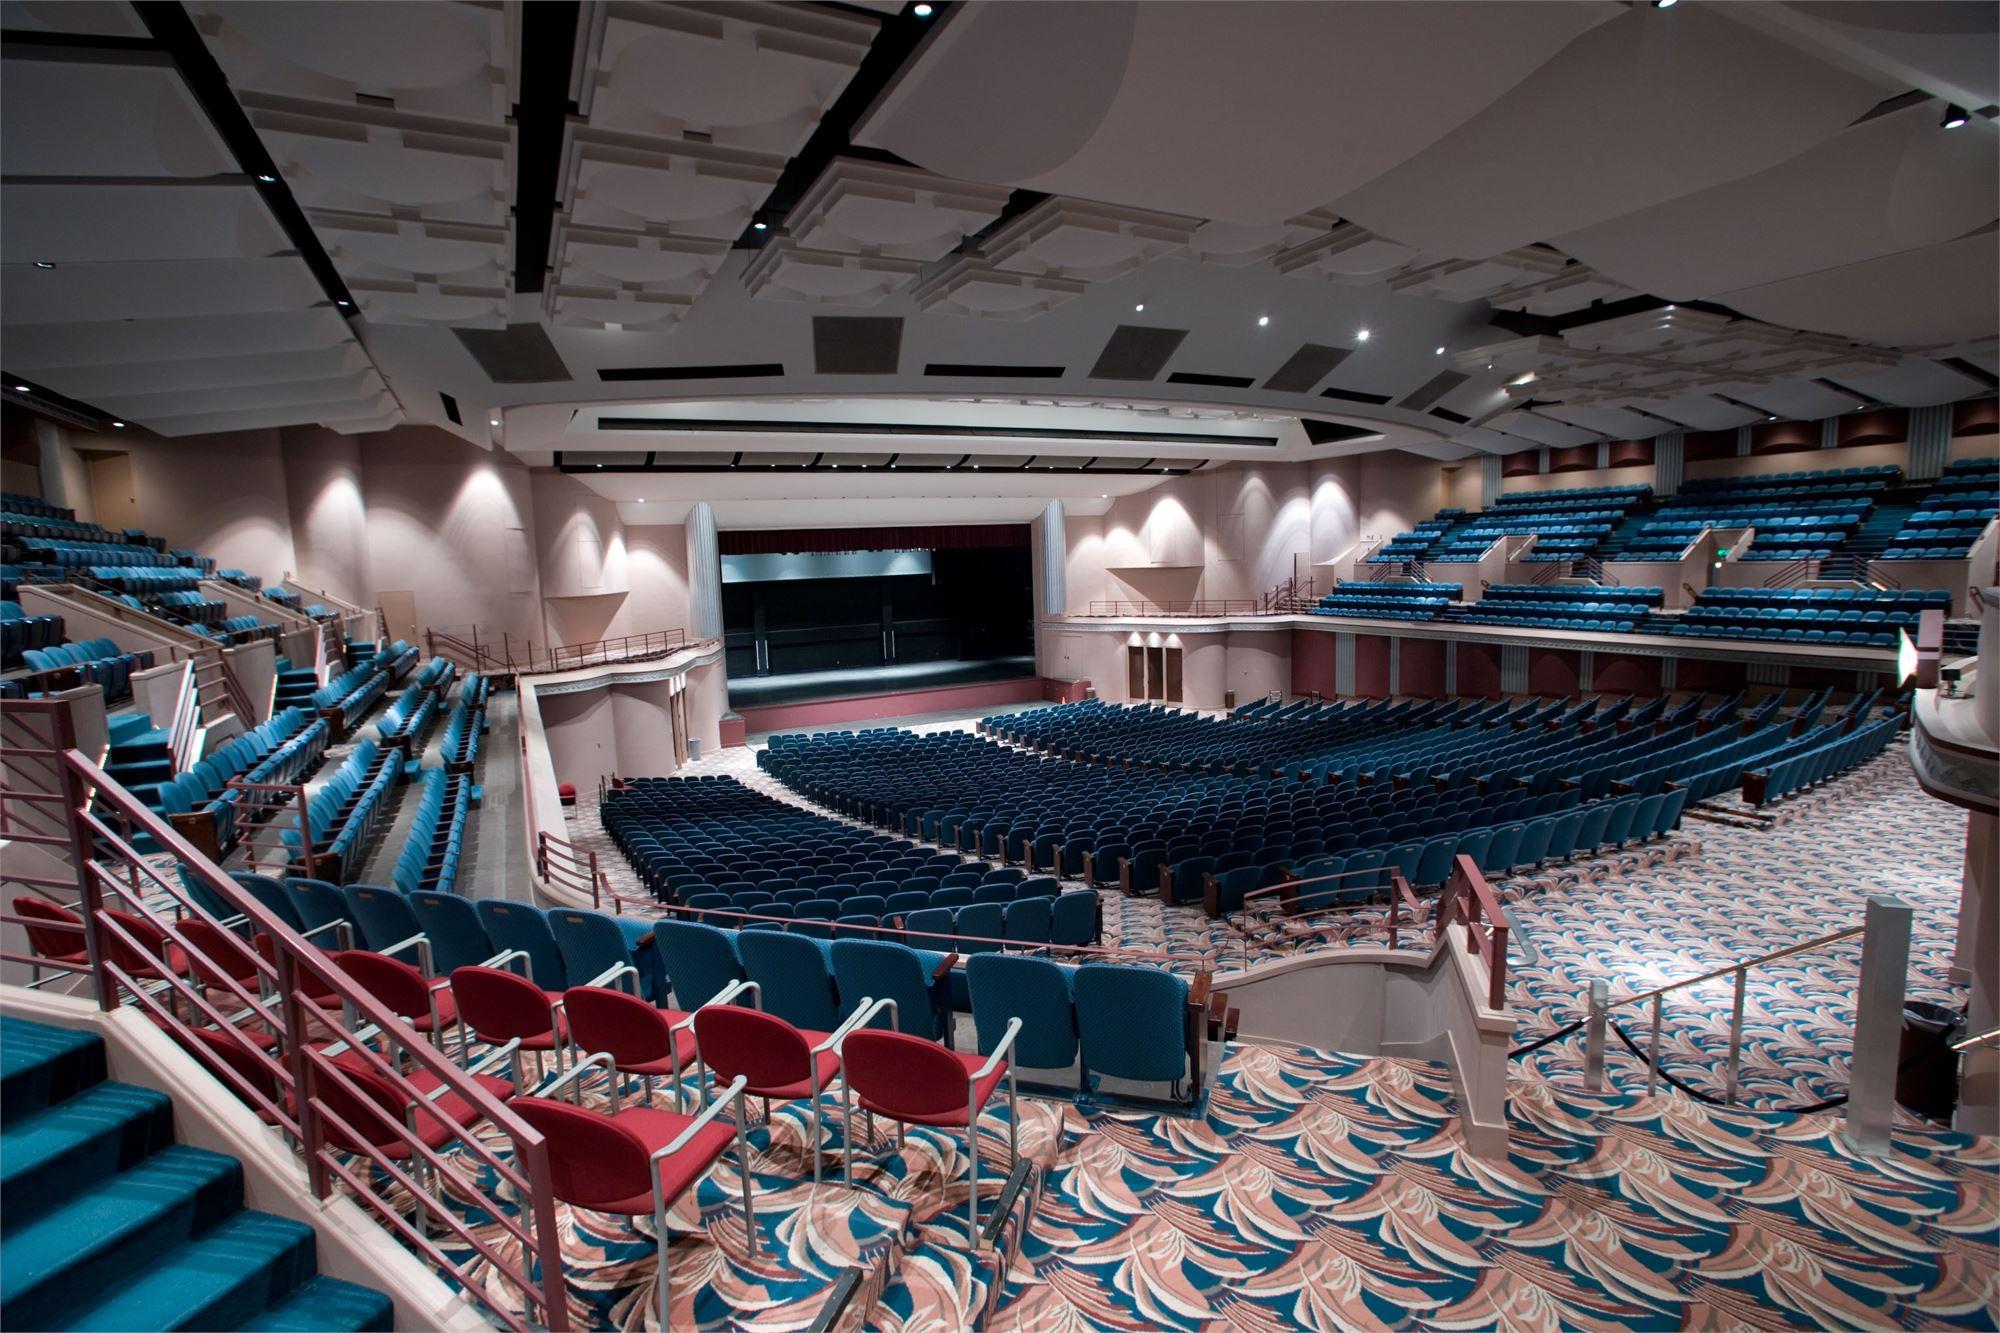 Georgia Neese Gray Performance Hall